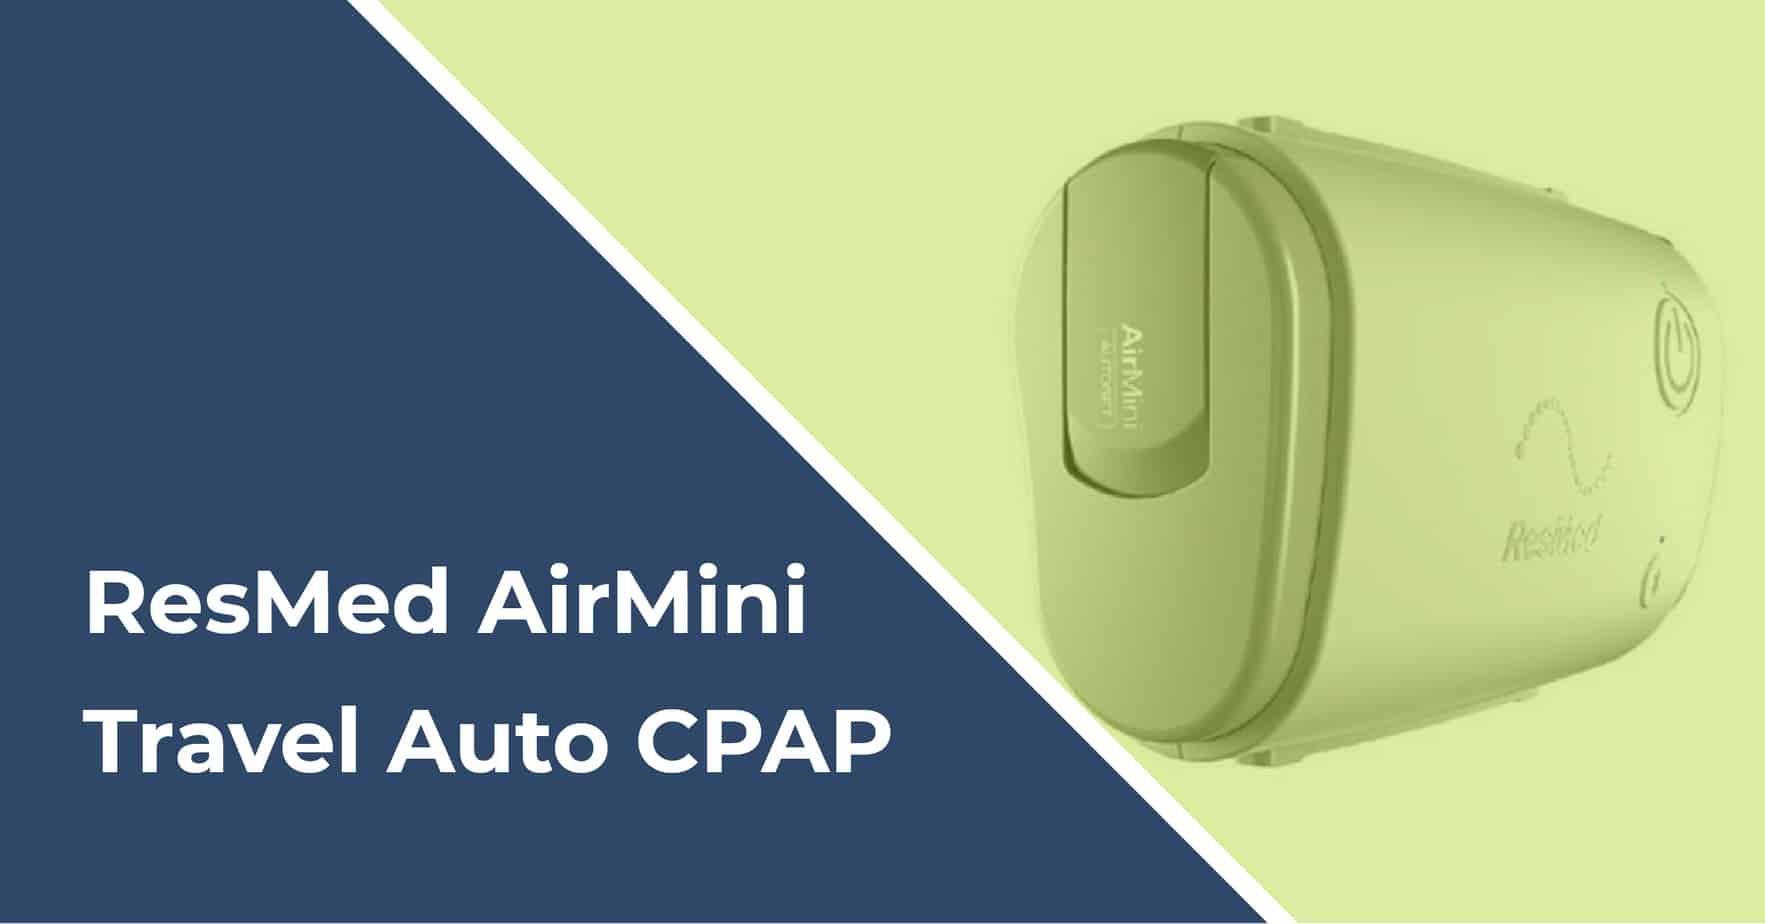 resmed airmini travel auto cpap